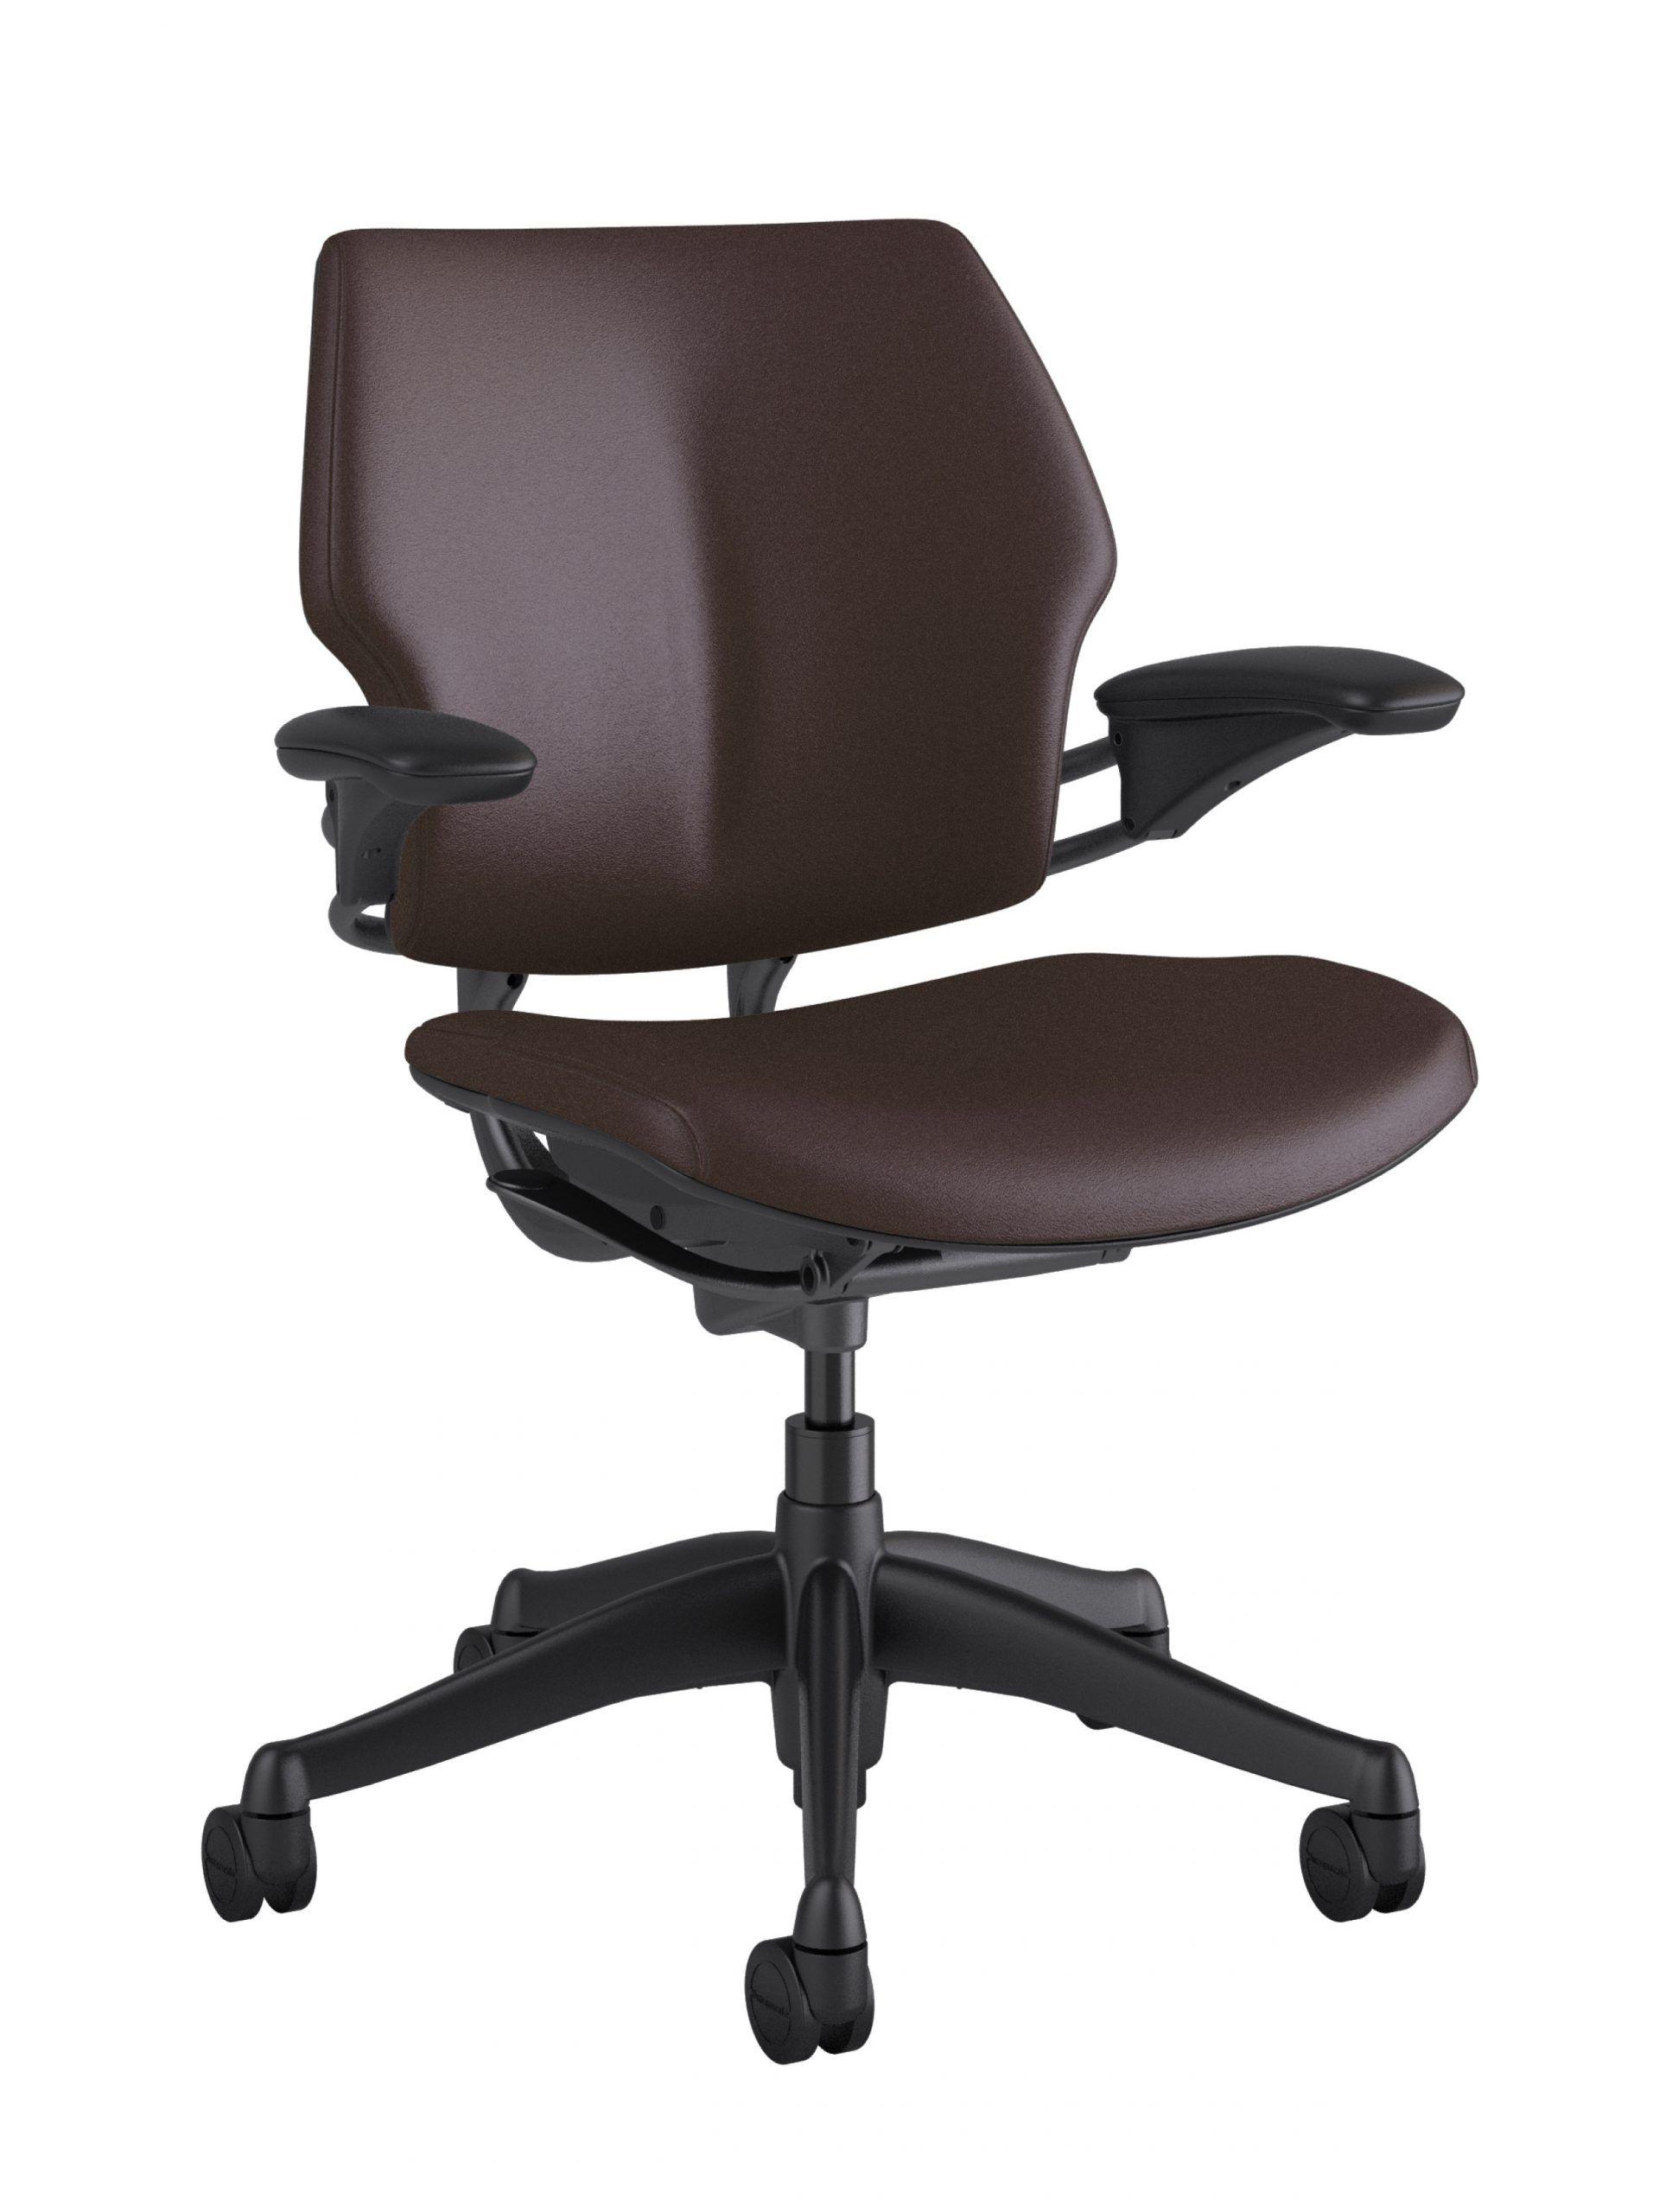 Office Chair Headrest Attachment 2021 In 2020 Office Chair Chair Headrest